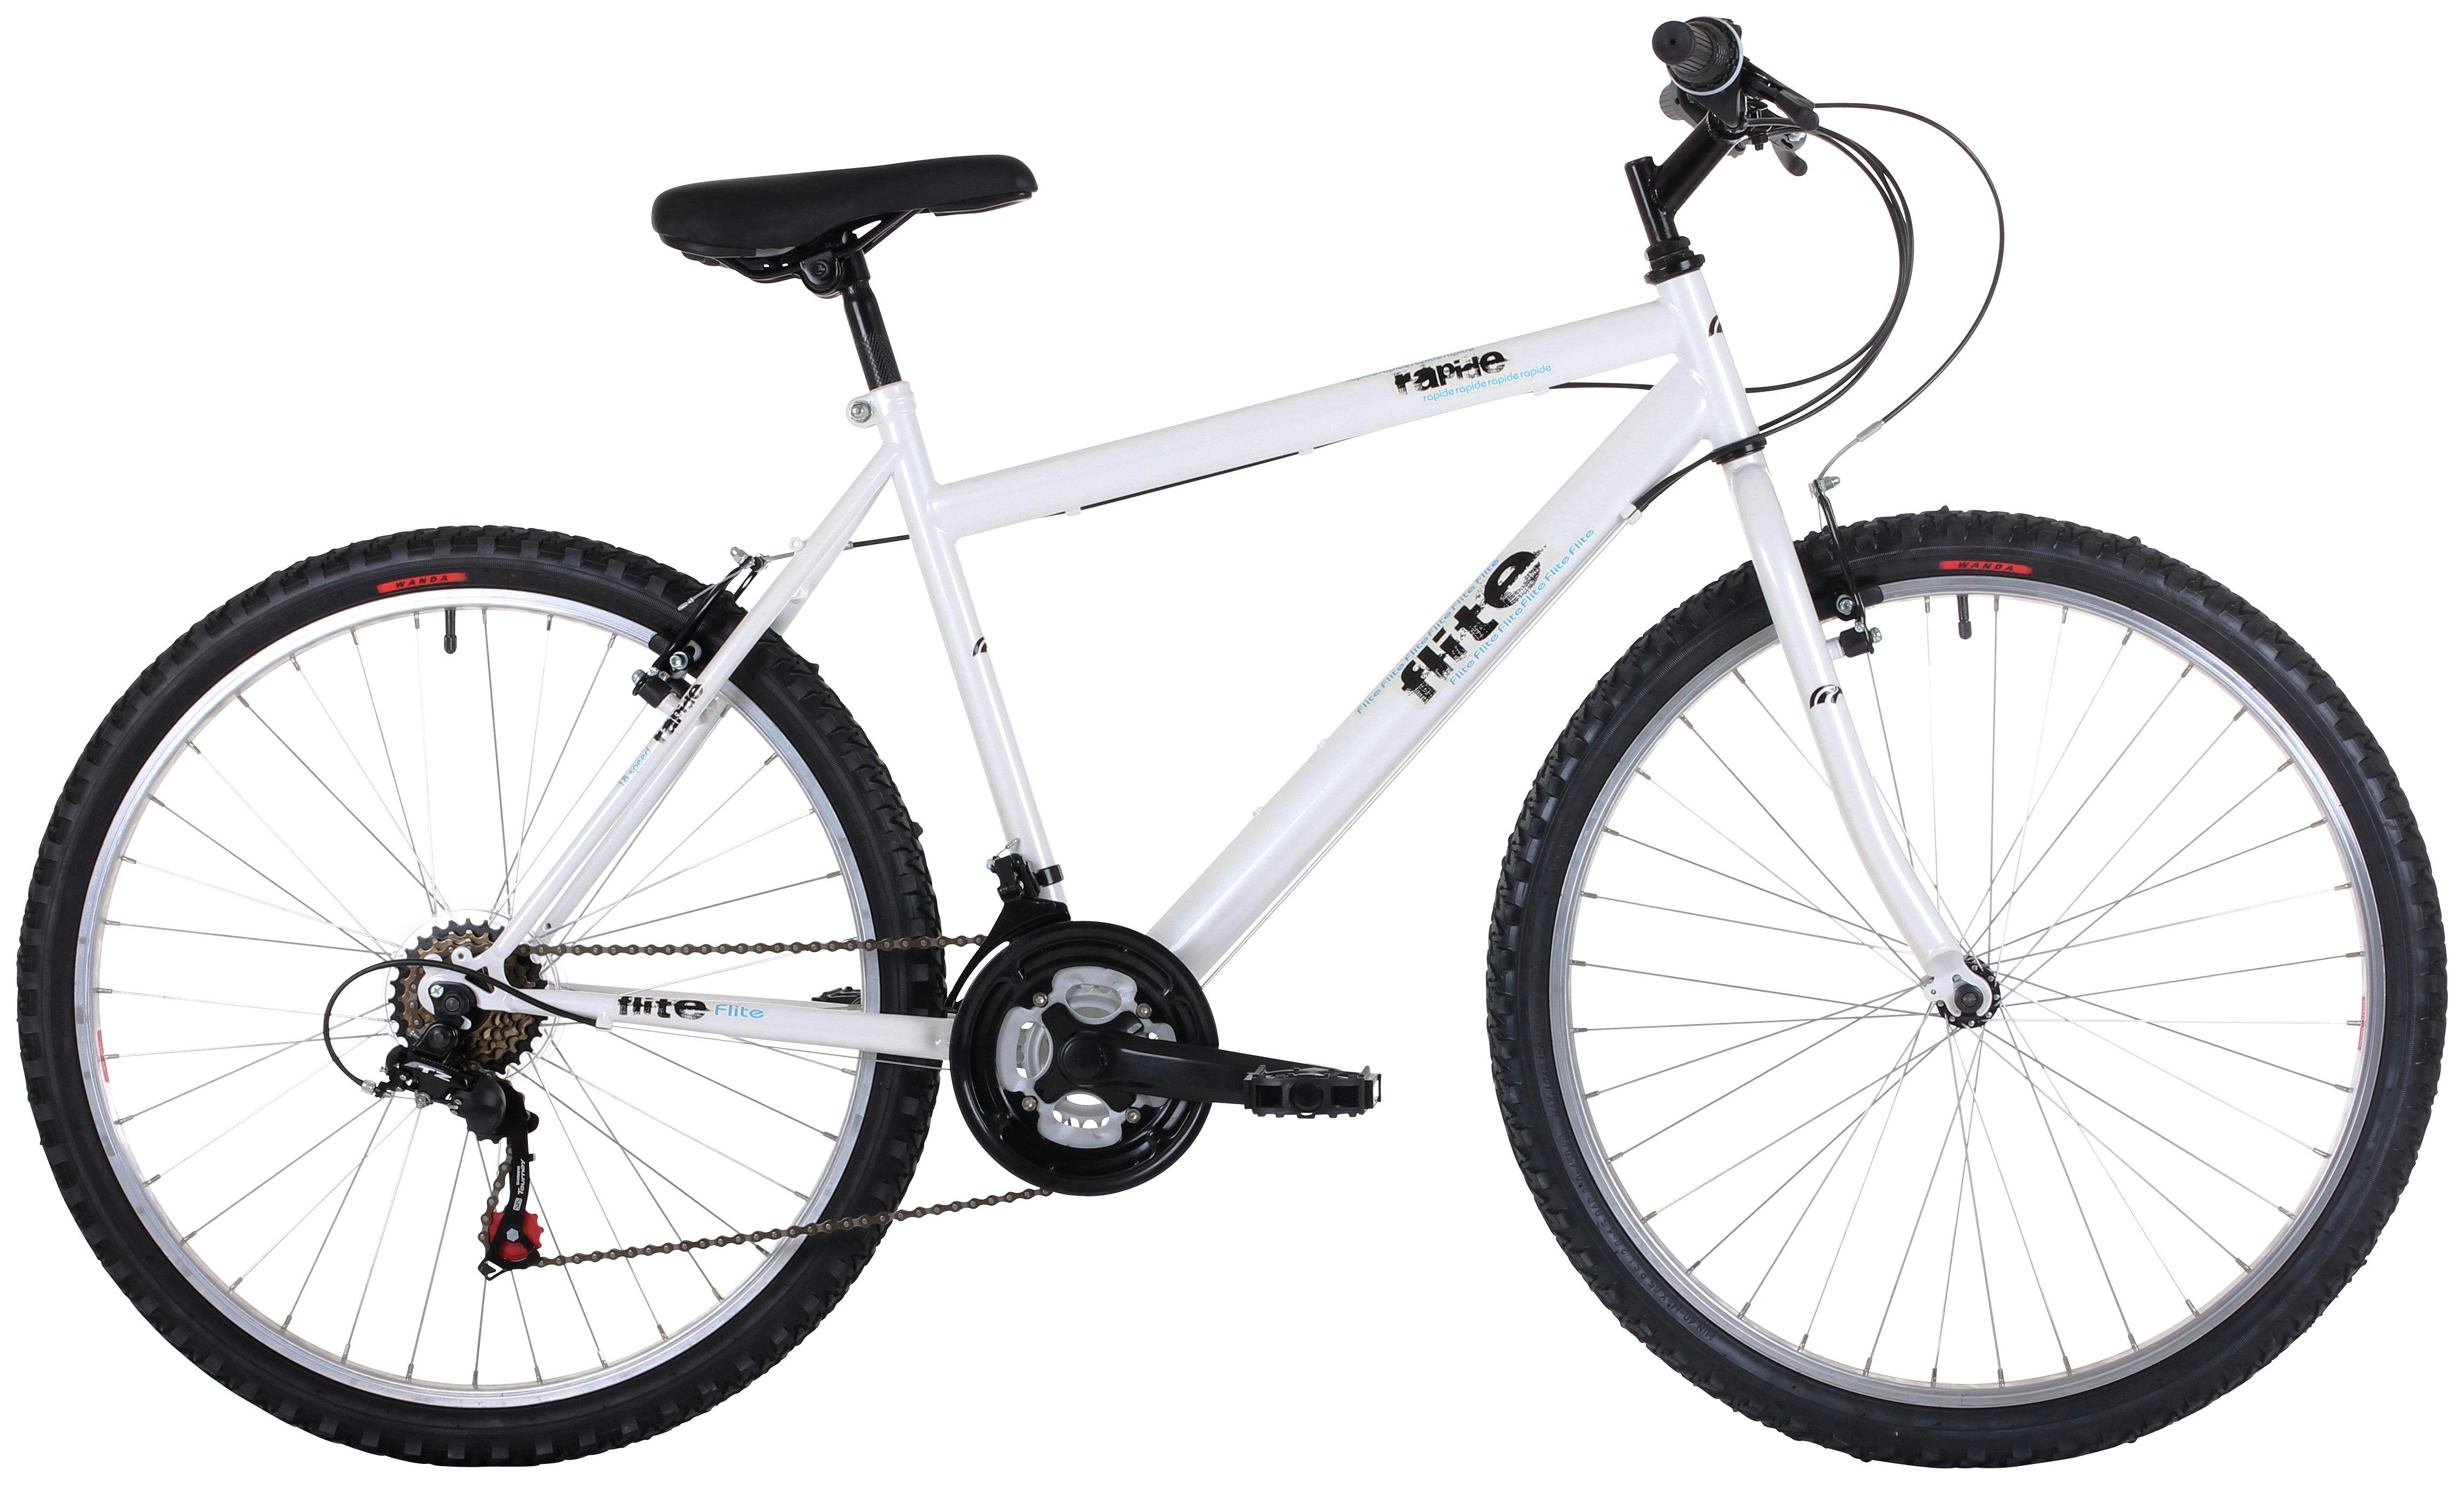 Image of Flite Rapide 20 Inch Mountain Bike